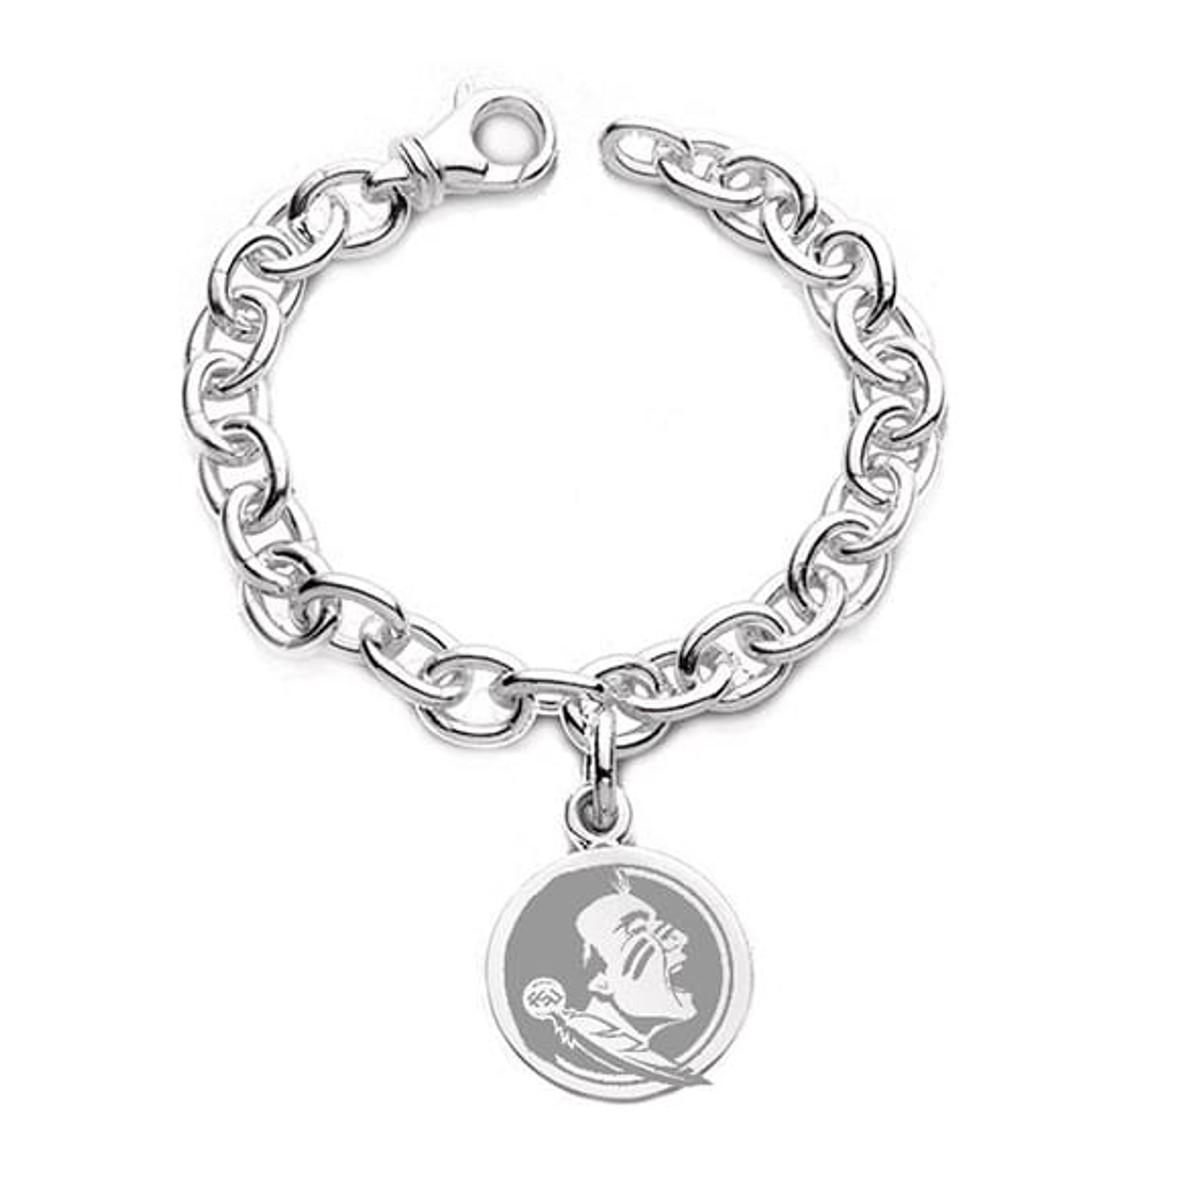 Florida State University Sterling Silver Charm Bracelet at